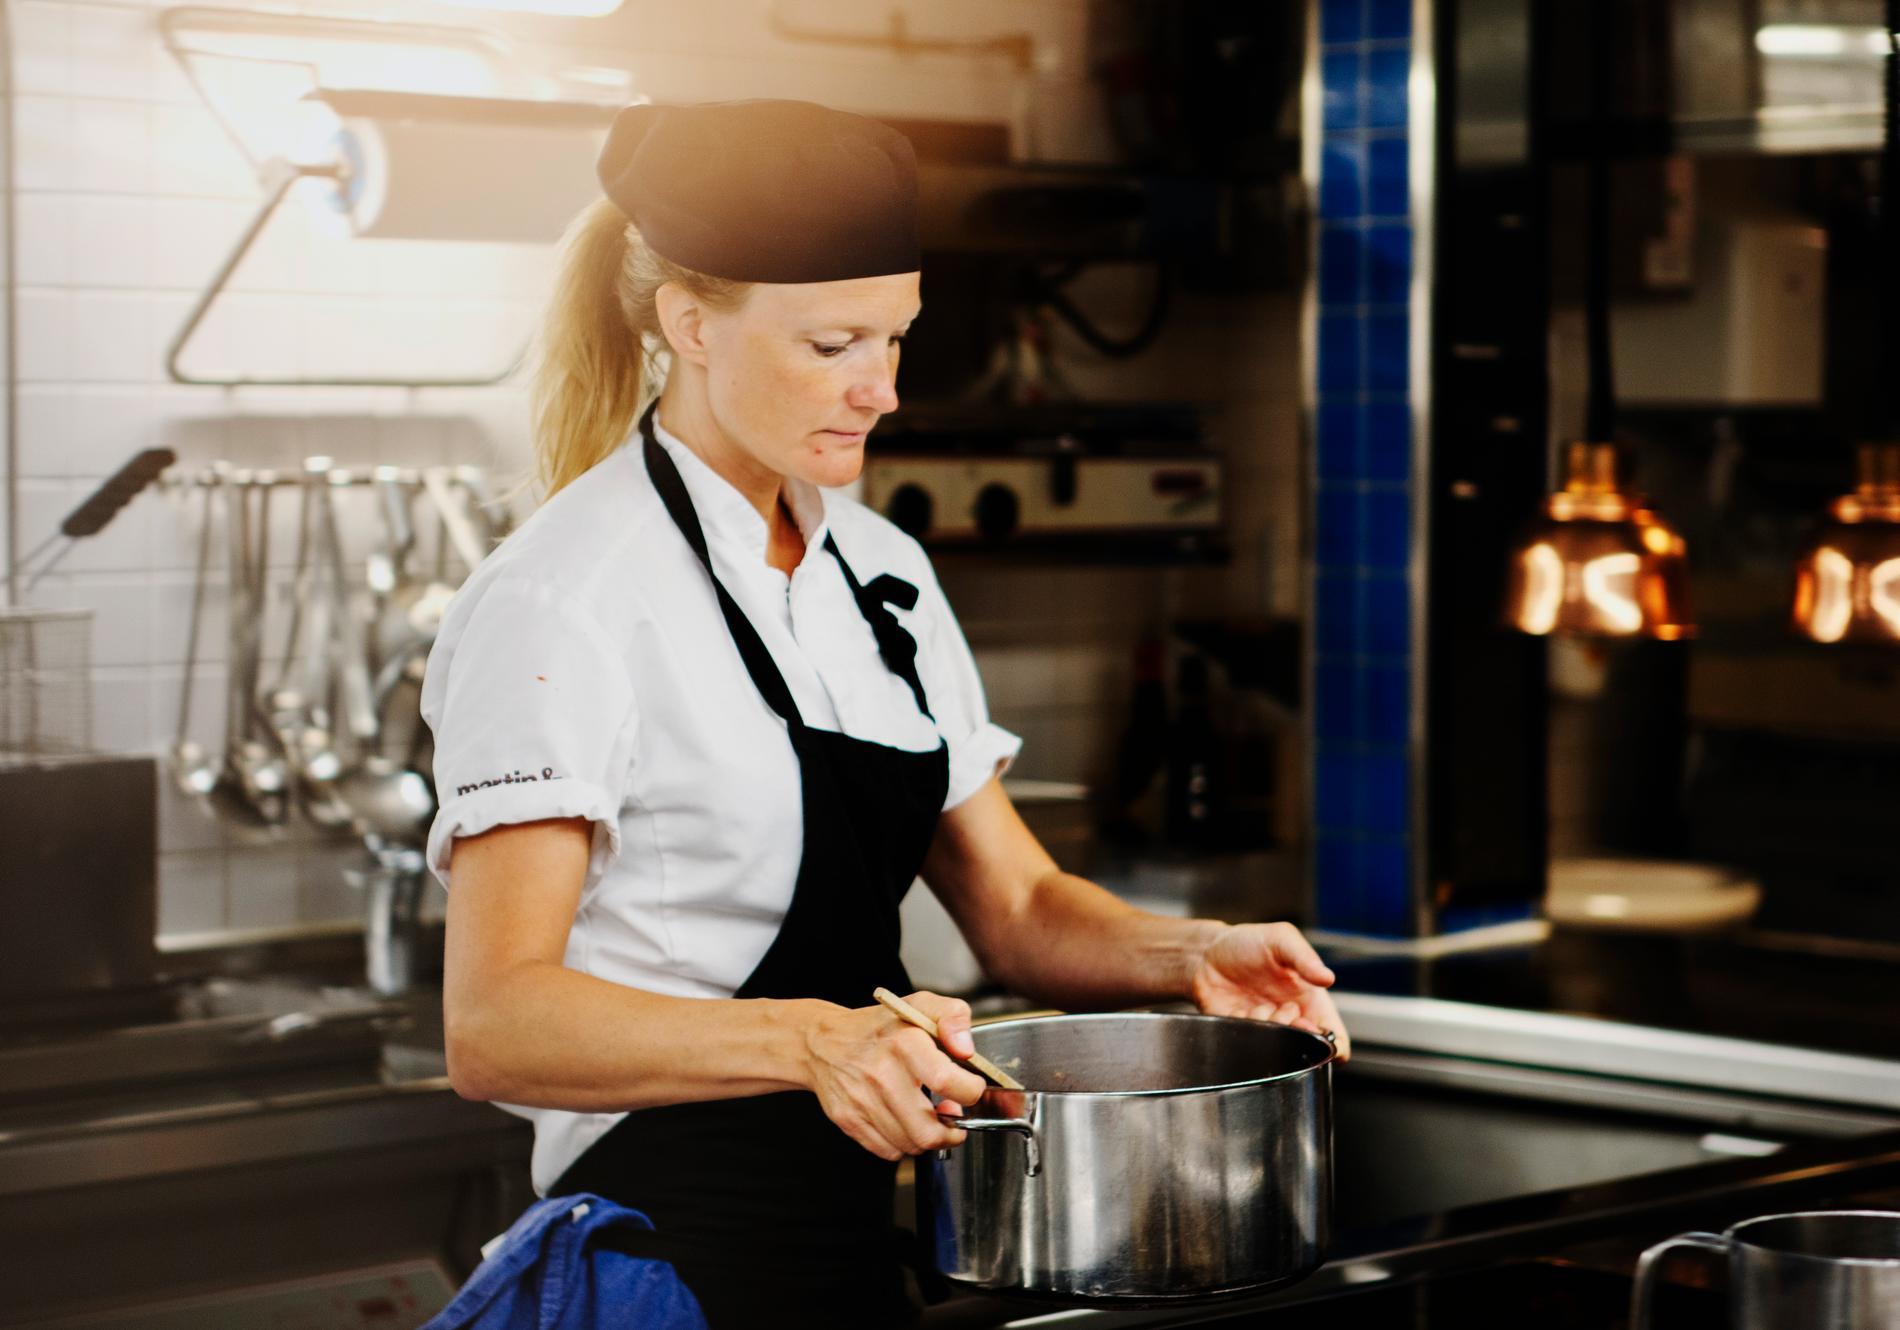 Nu har Karin Sundgrens No waste-middagar blivit  kokbok.